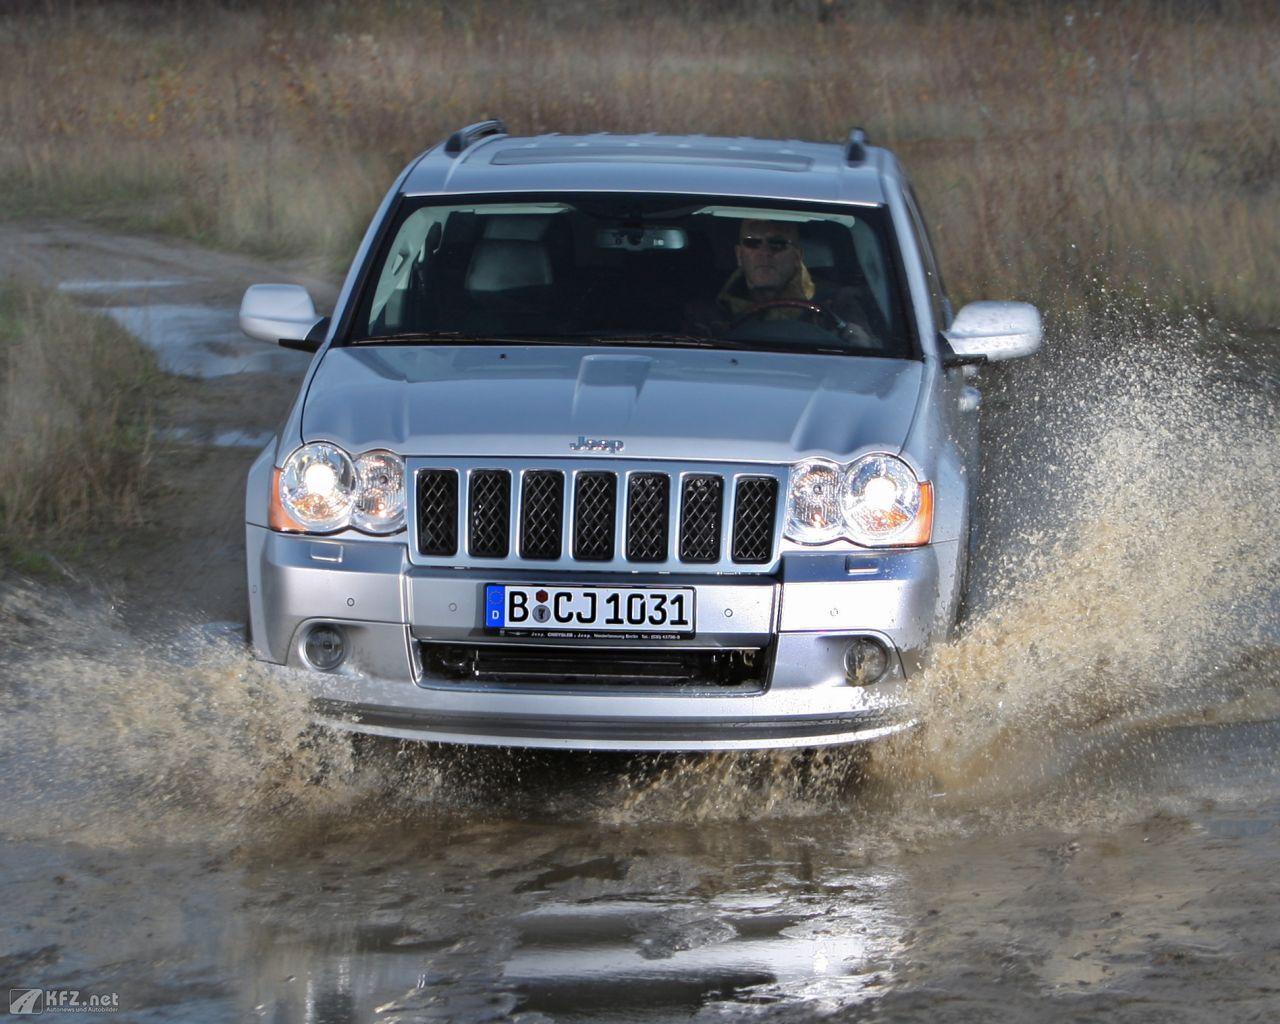 jeep-grand-cherokee-1280x1024-1